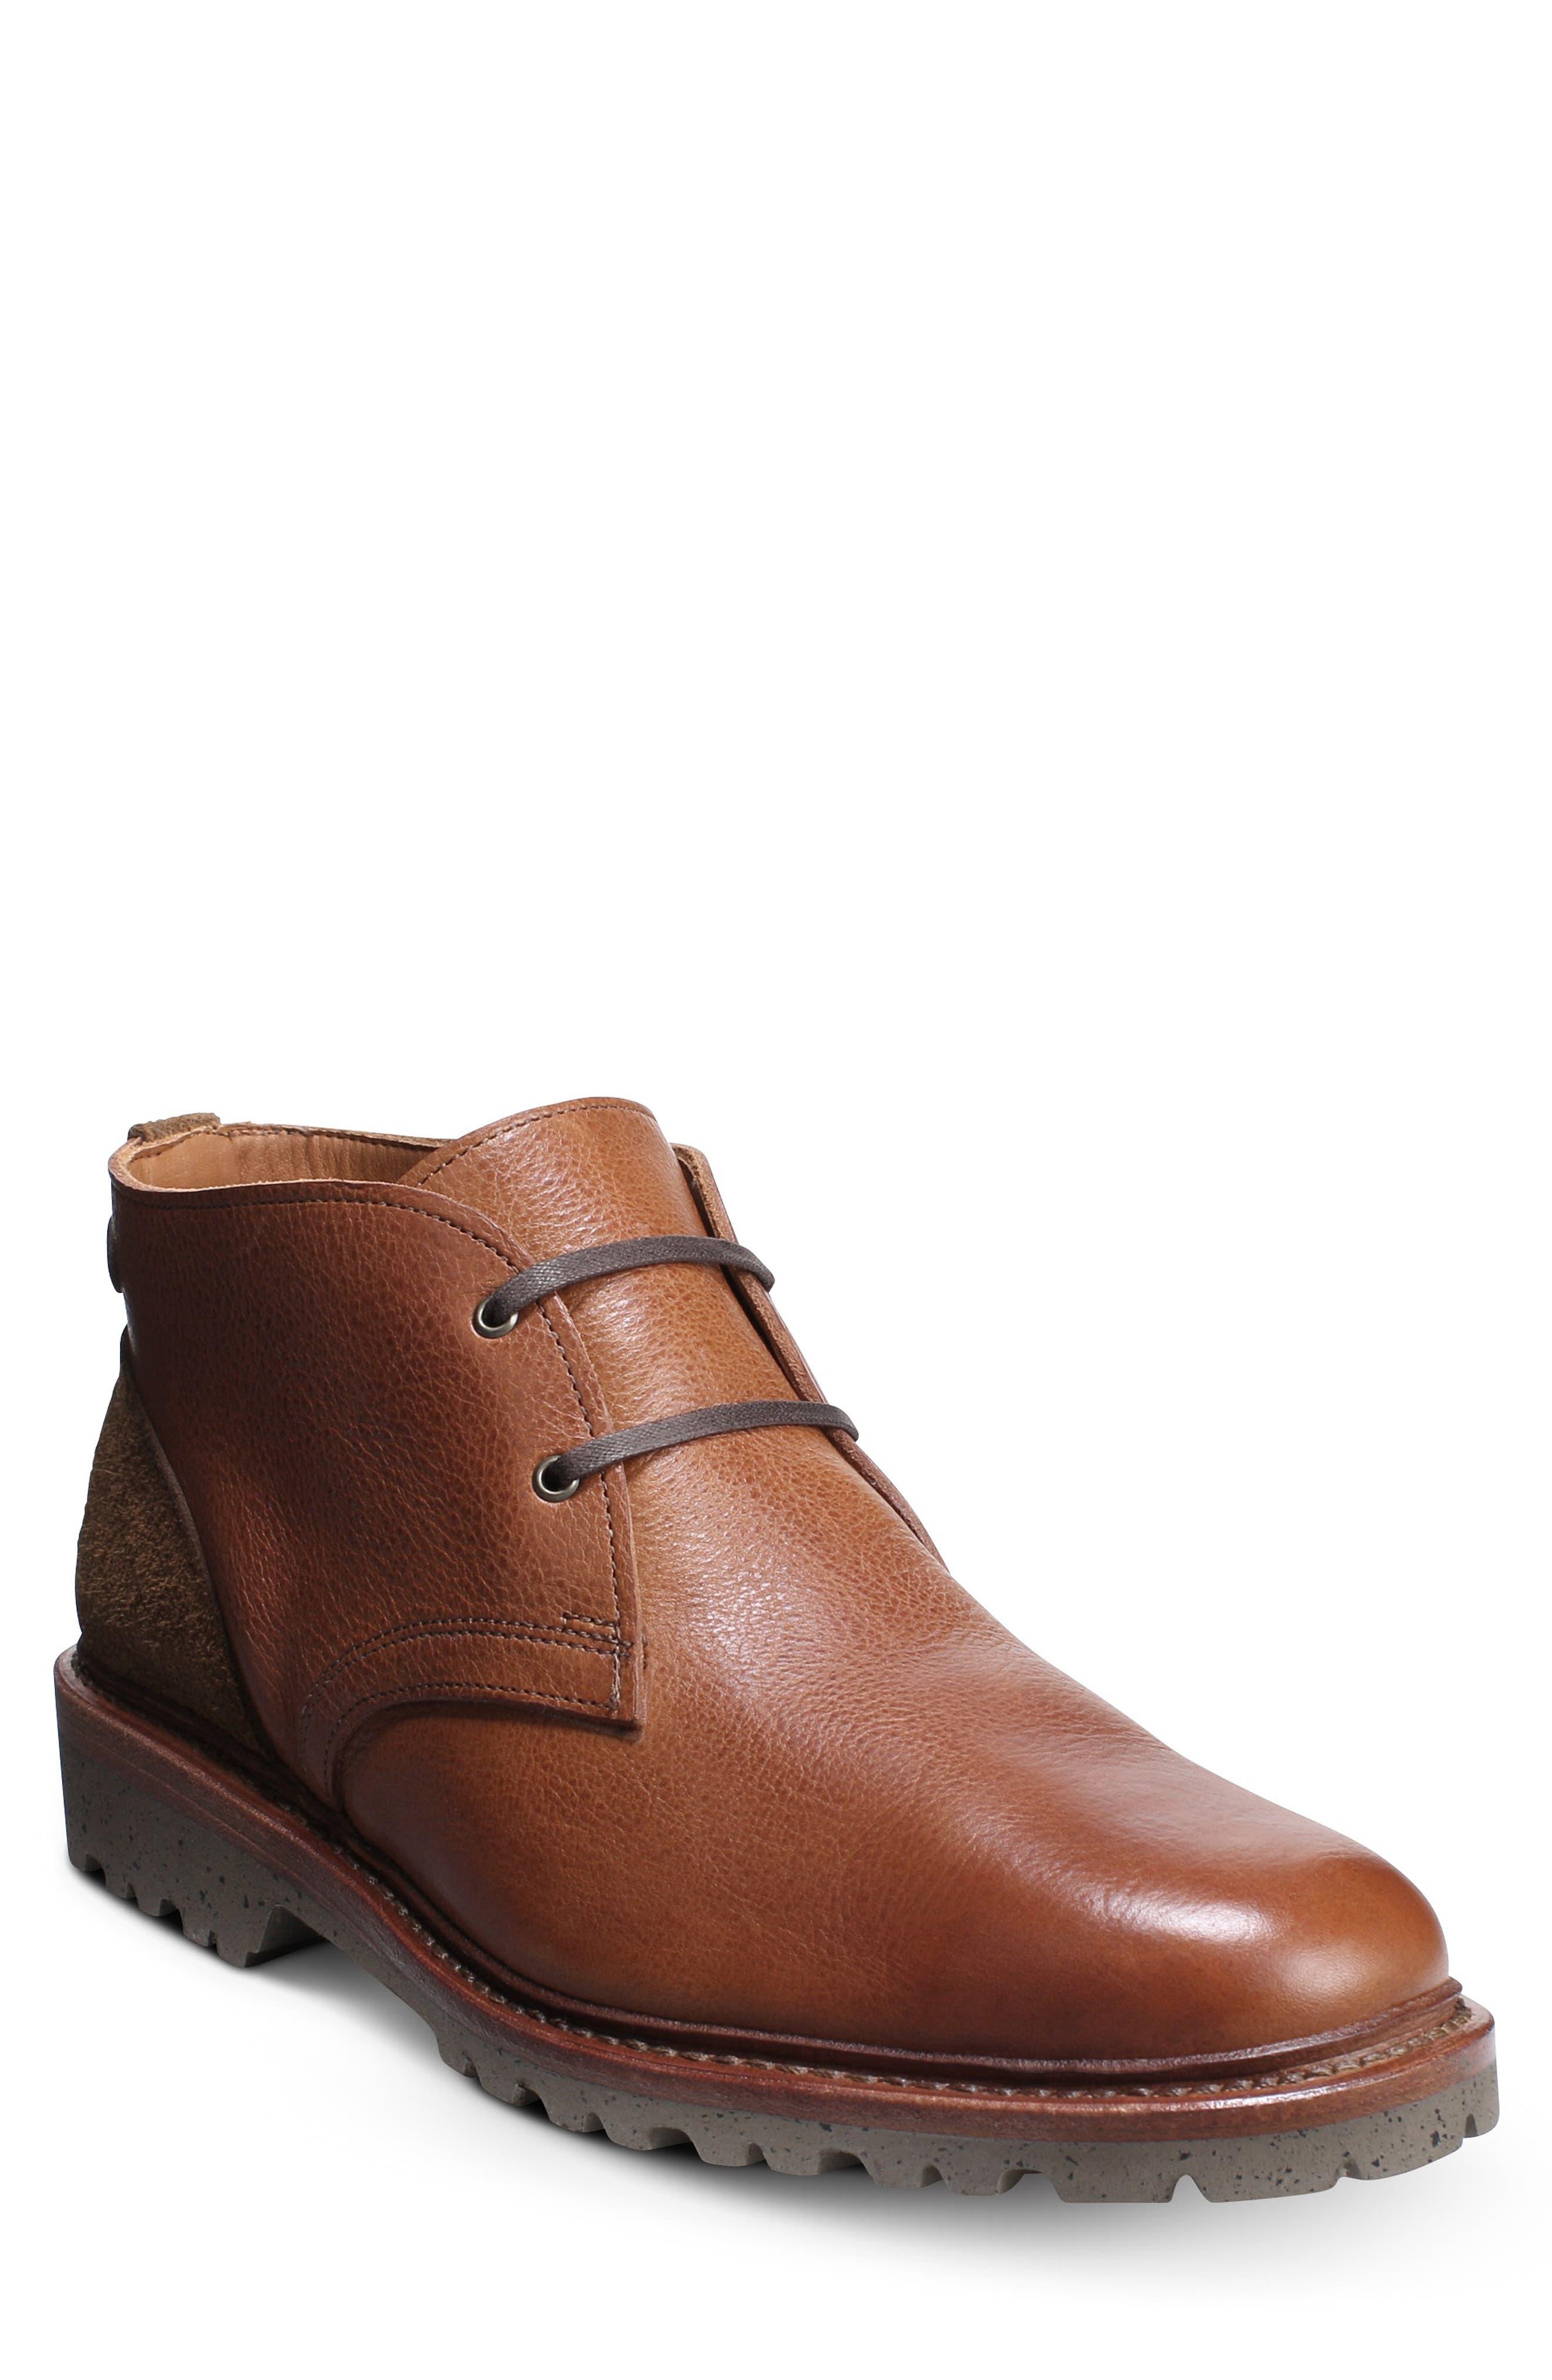 Discovery Chukka Boot